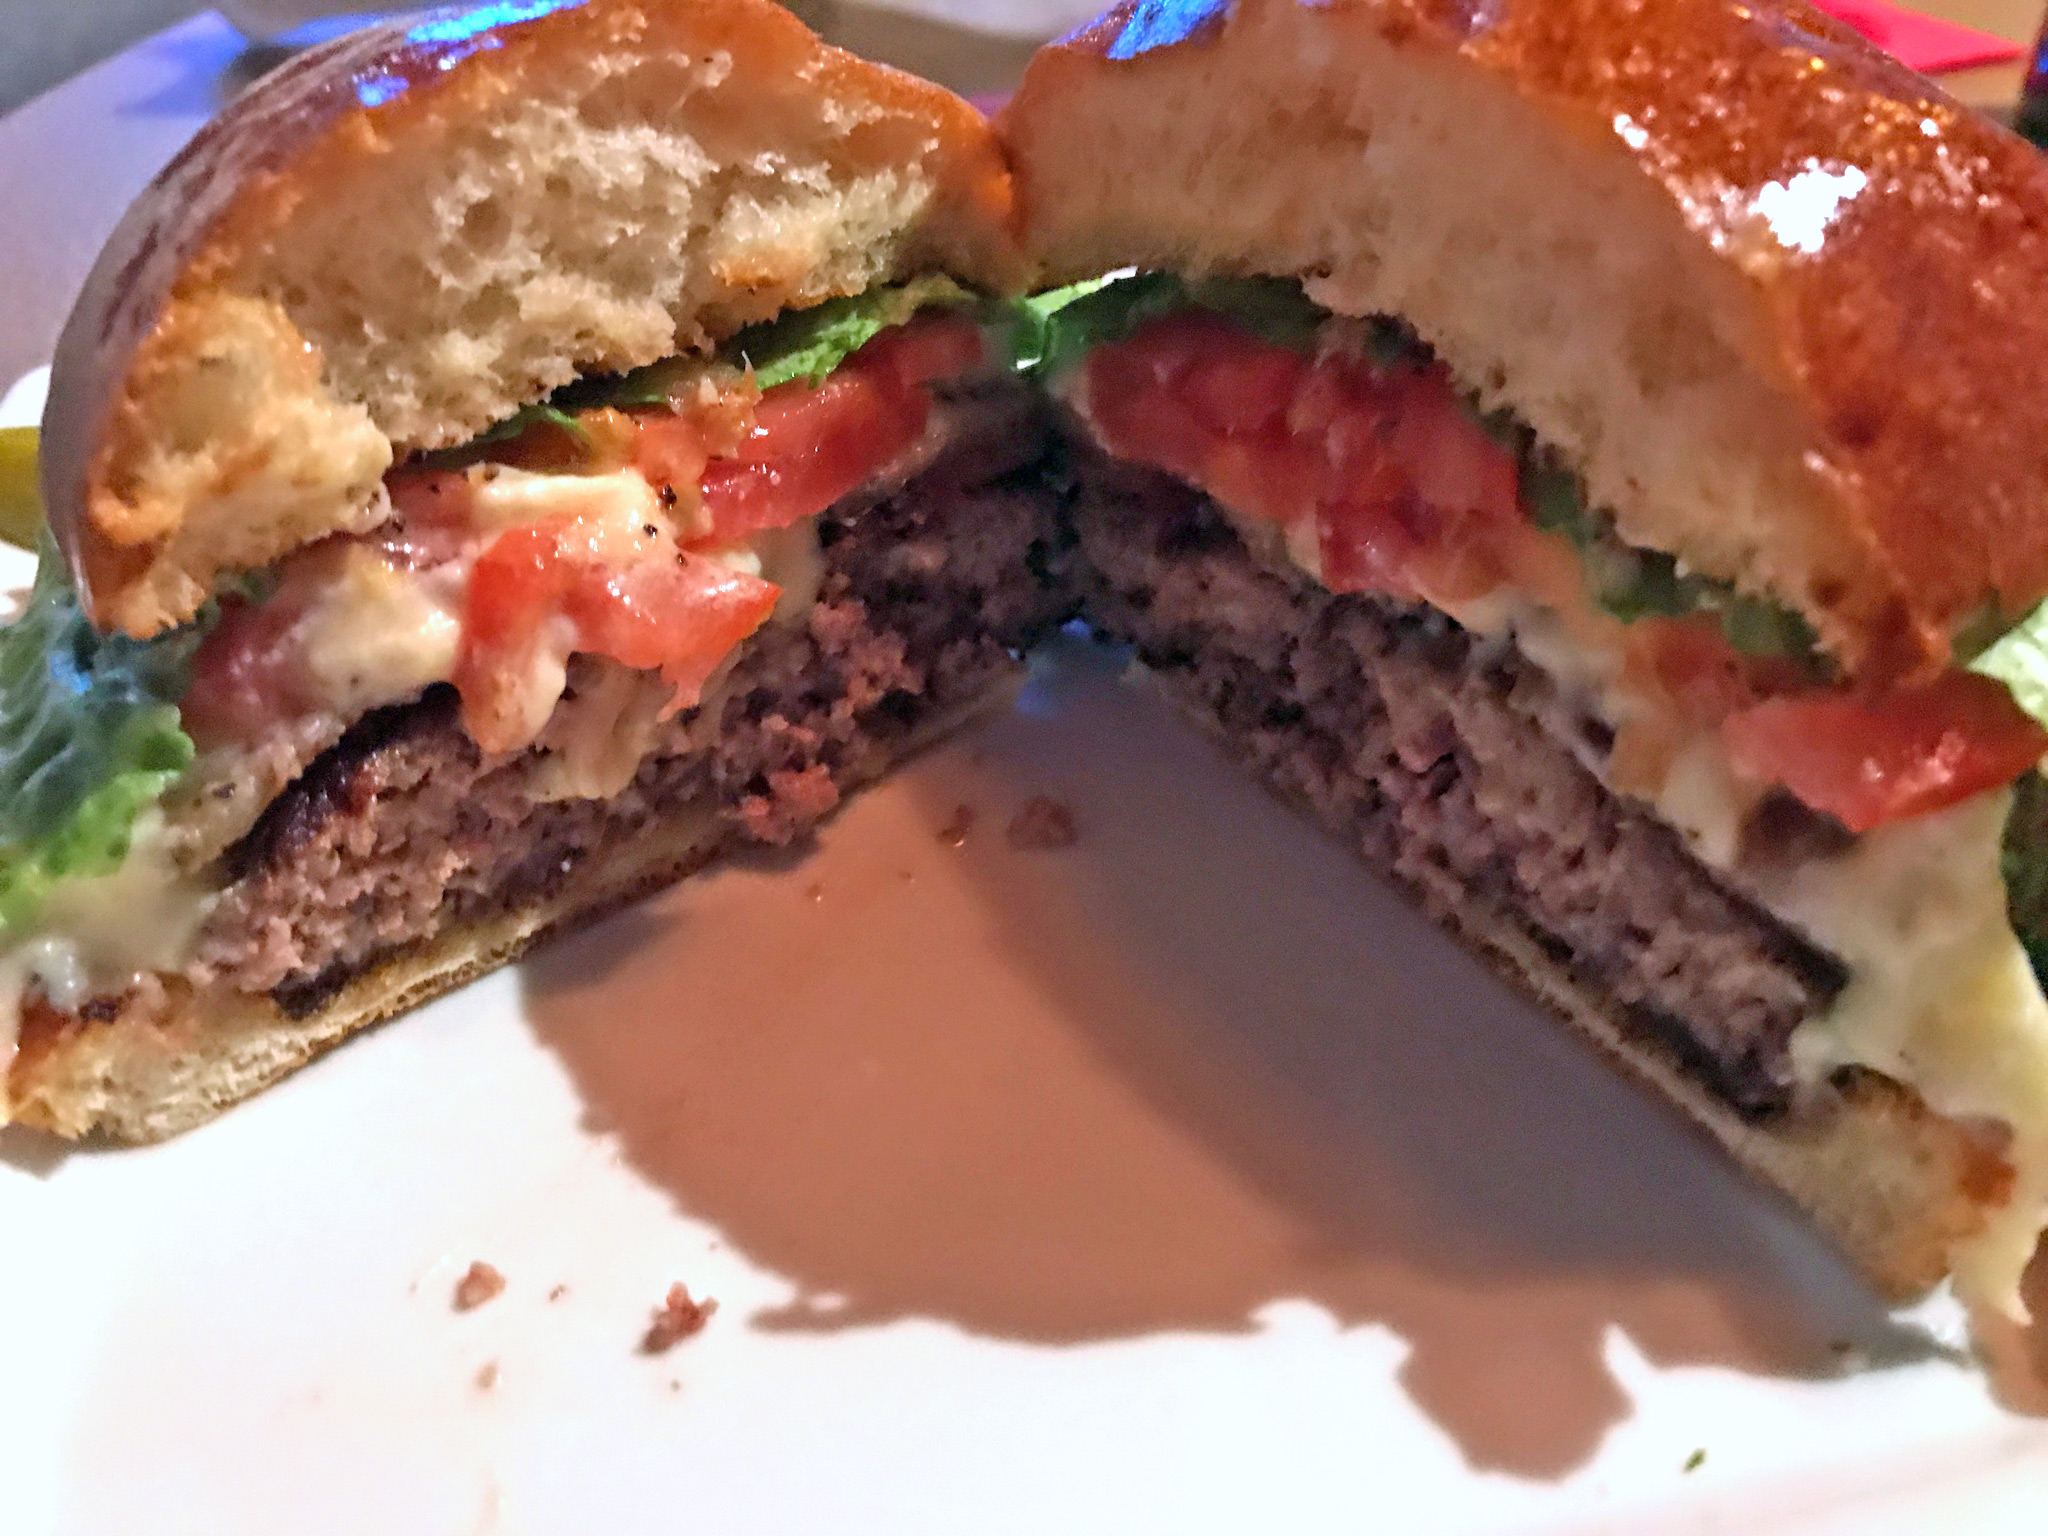 The Jimmy Burger, Assembled & Cut in Half